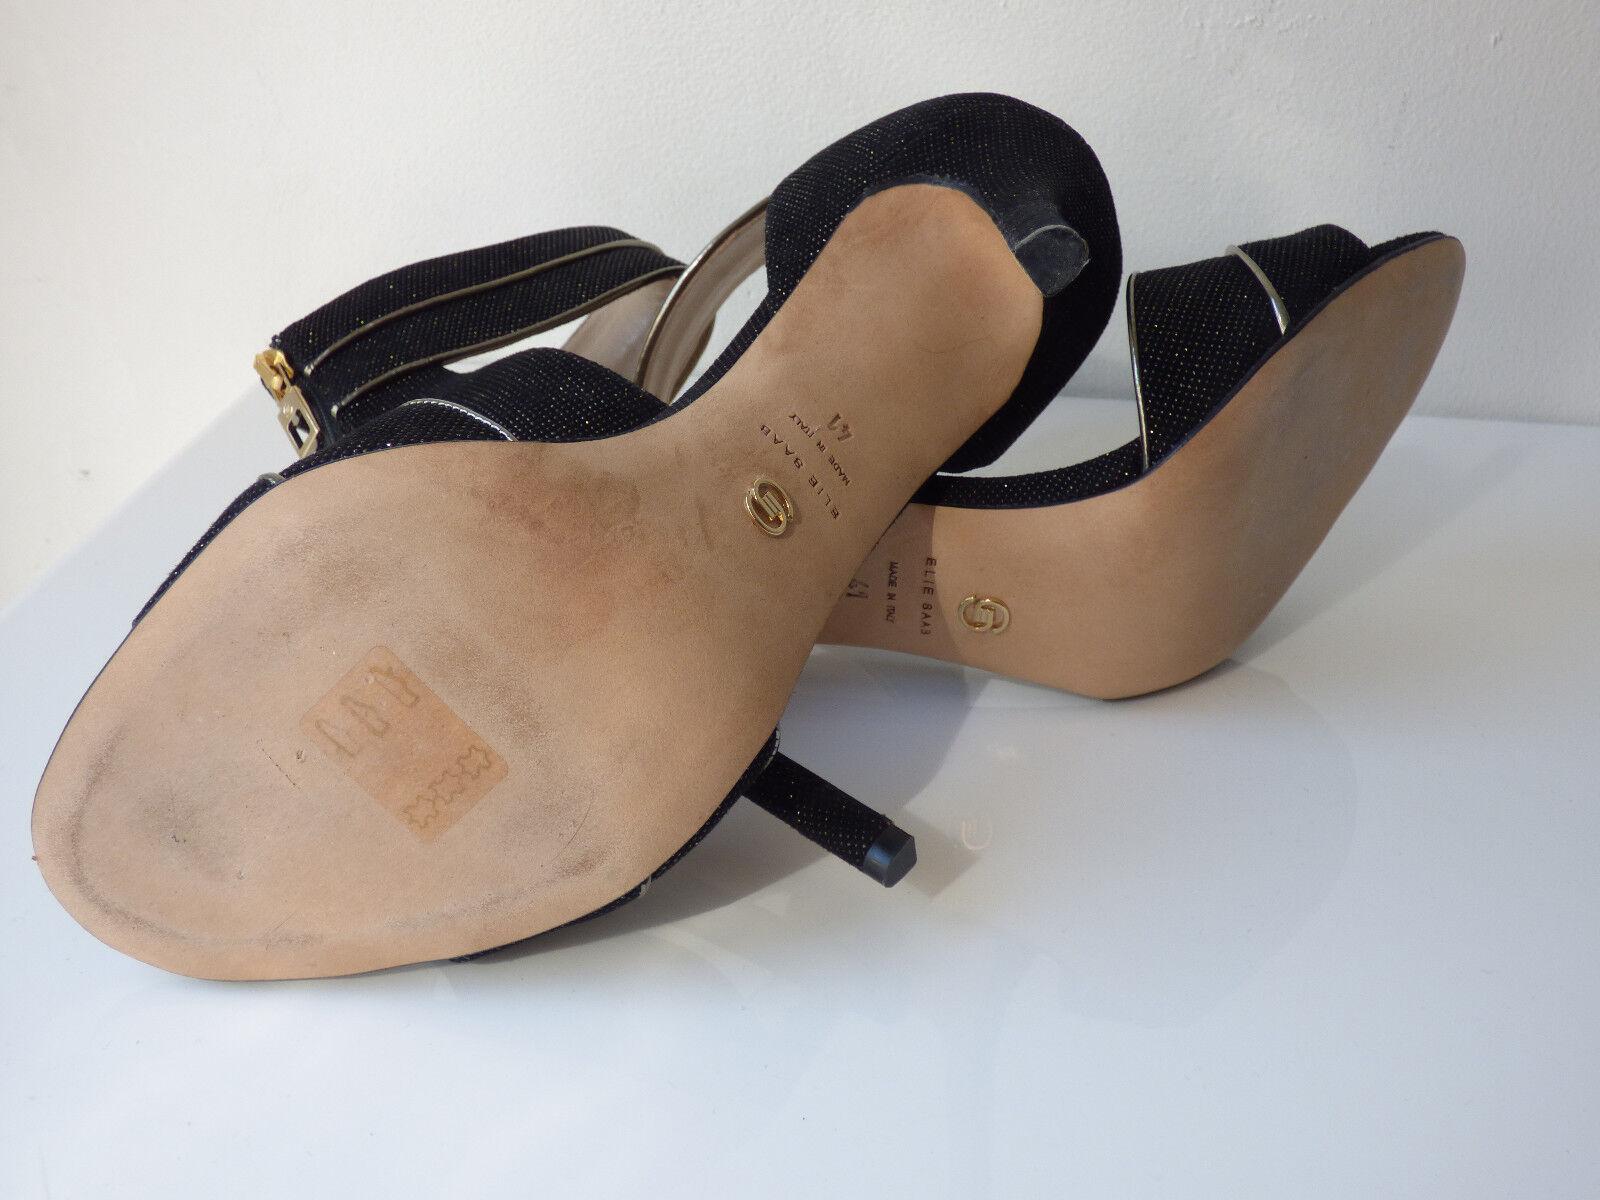 Escarpins en cuir black et doré ELIE SAAB SAAB SAAB 0fe6c0